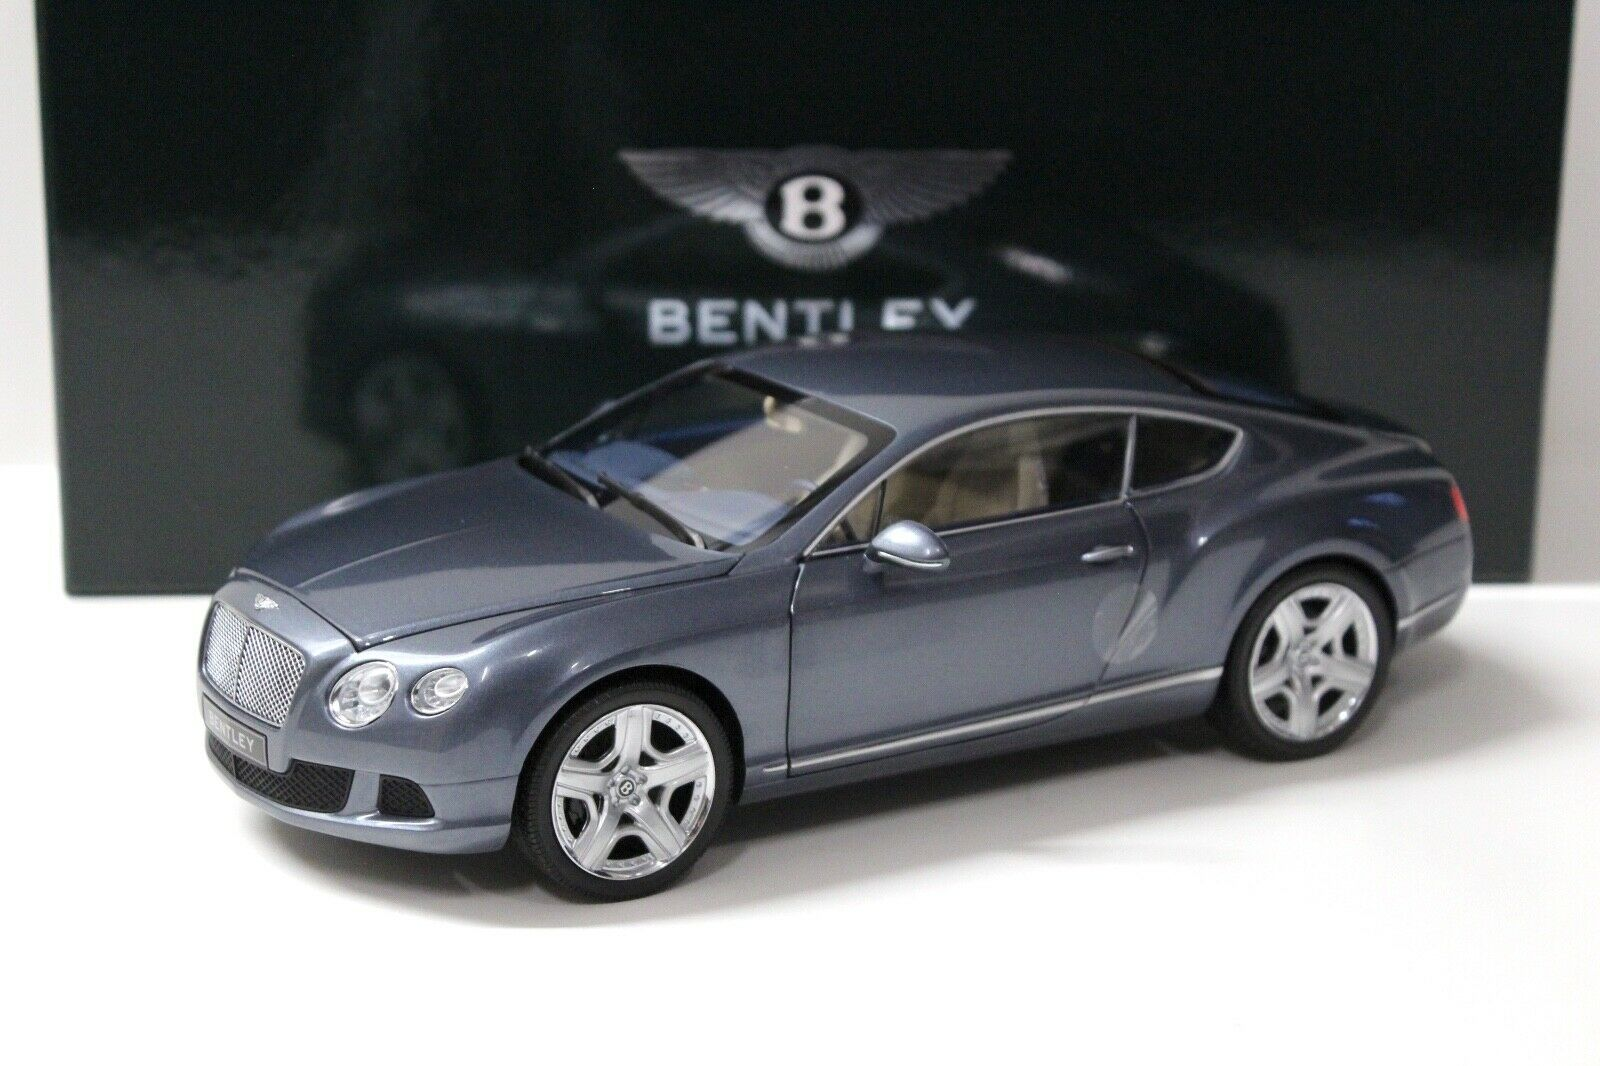 1:18 Minichamps BENTLEY CONTINENTAL GT 2011 Grey spacciatori NEW in Premium-MODELCAR